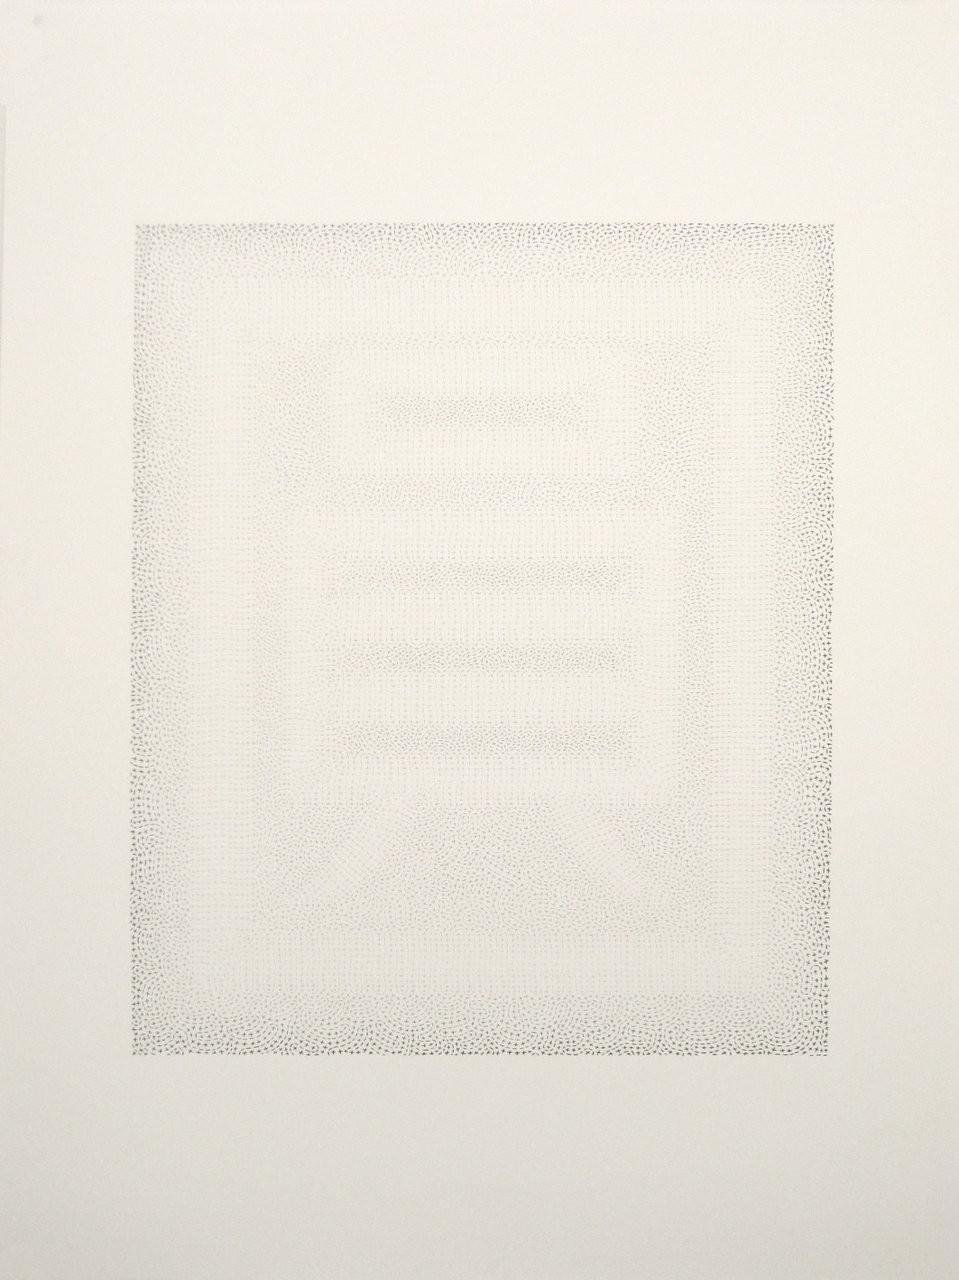 HKD, Pencil on paper, 700 mm x 500 mm